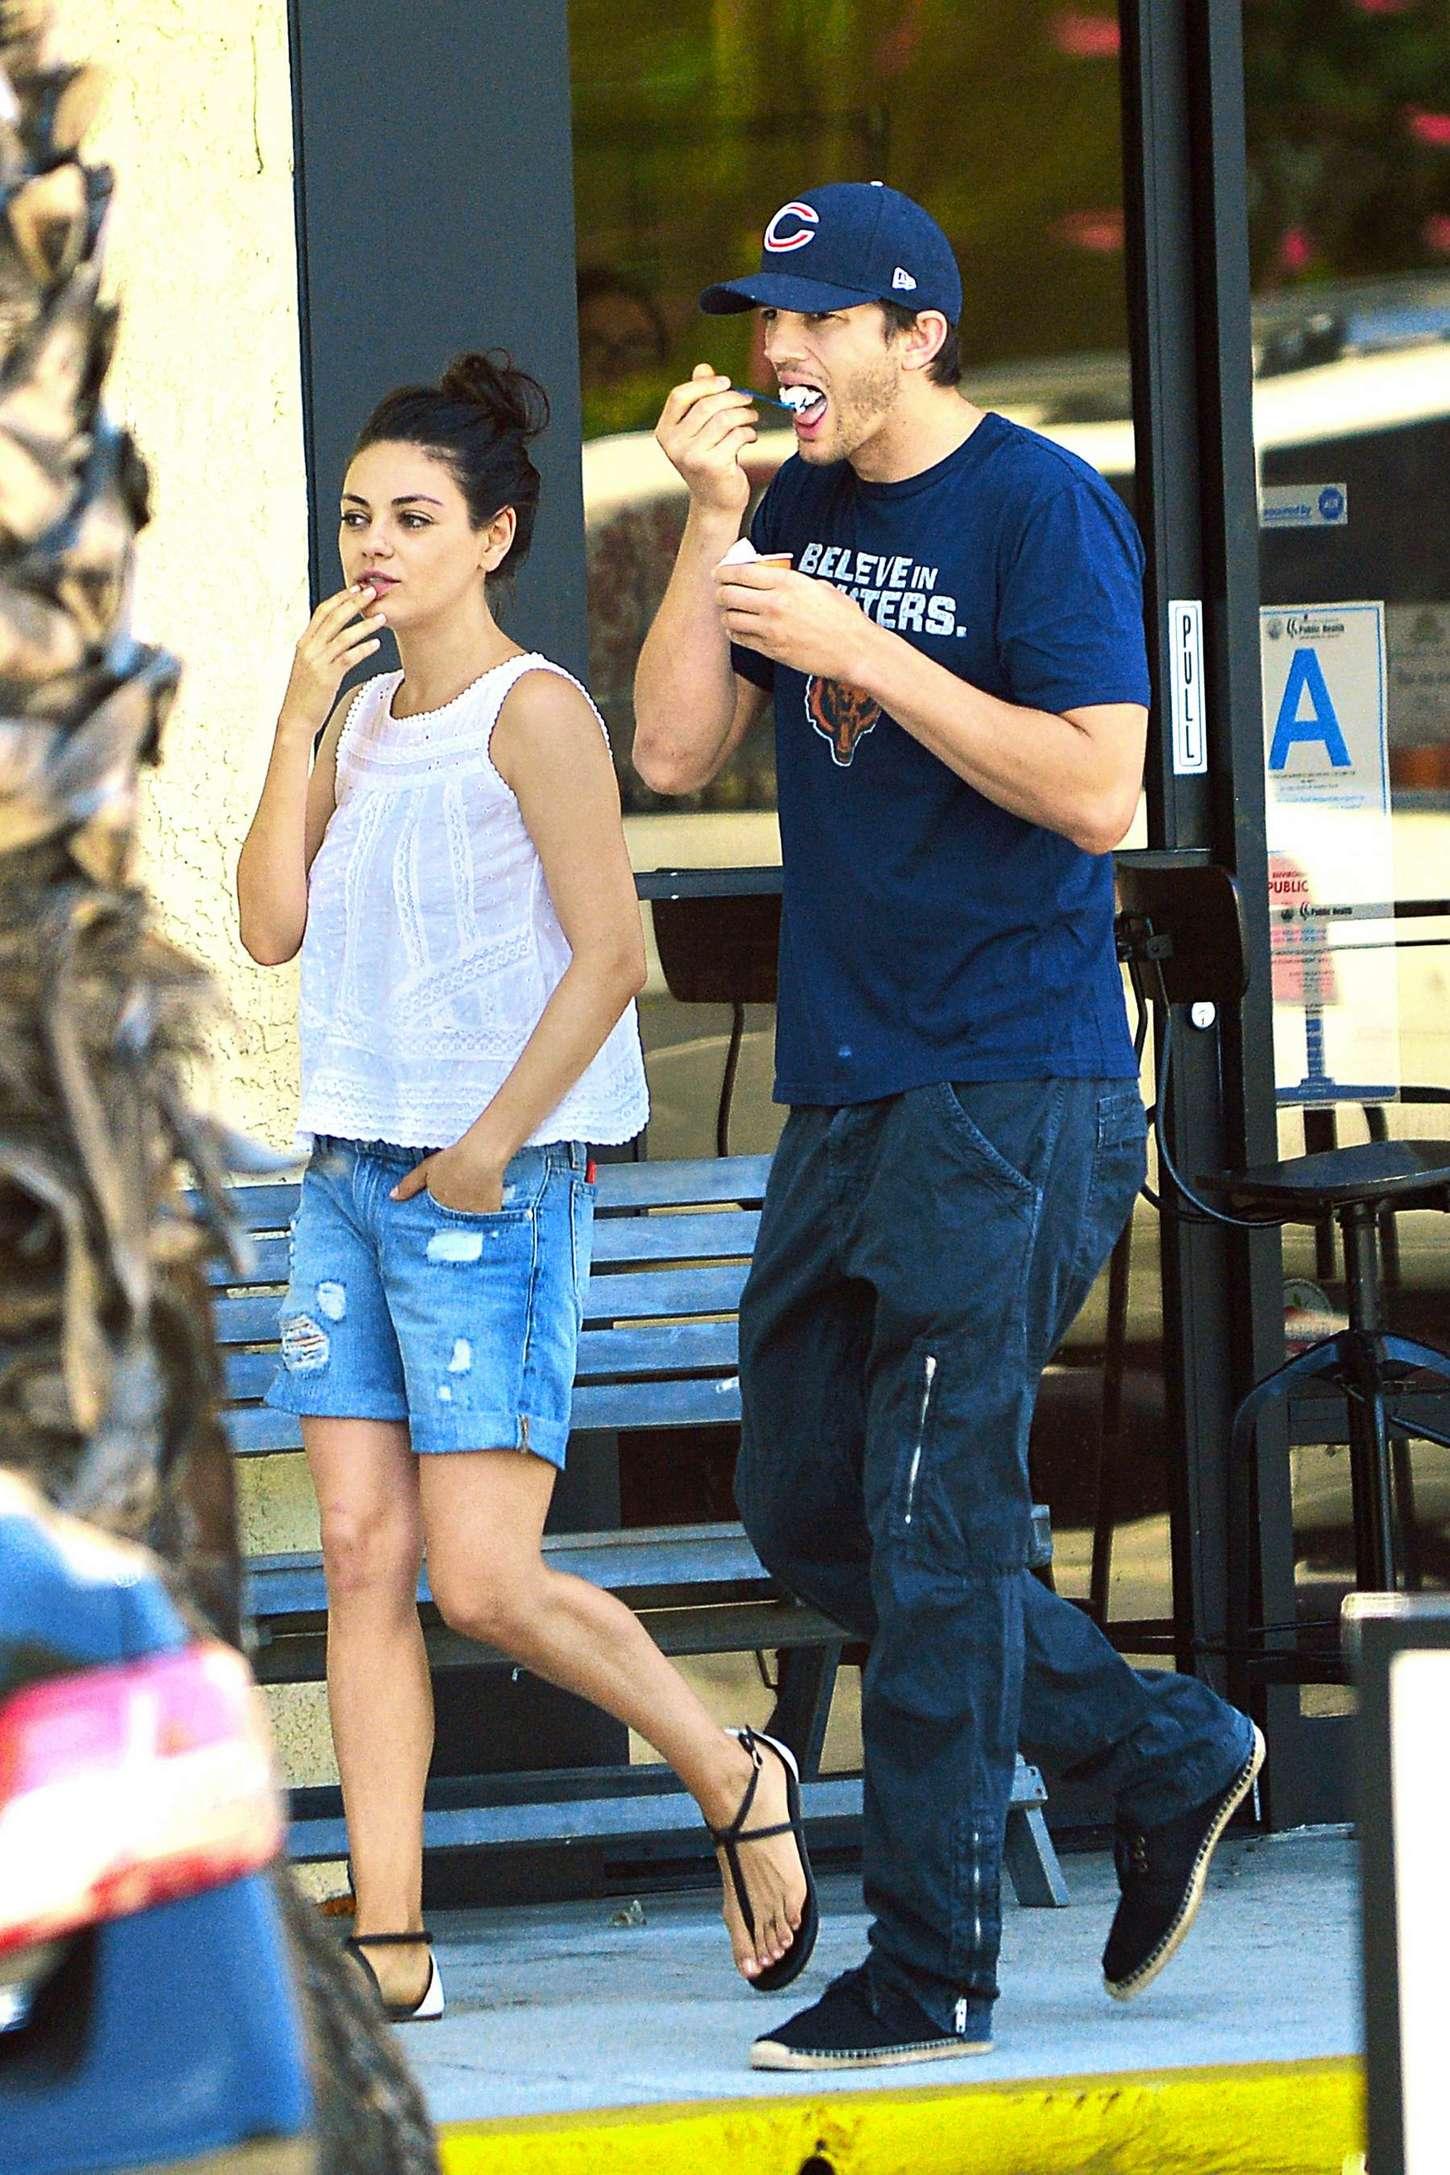 Mila Kunis and Ashton Kutcher at Spa Date in Studio City